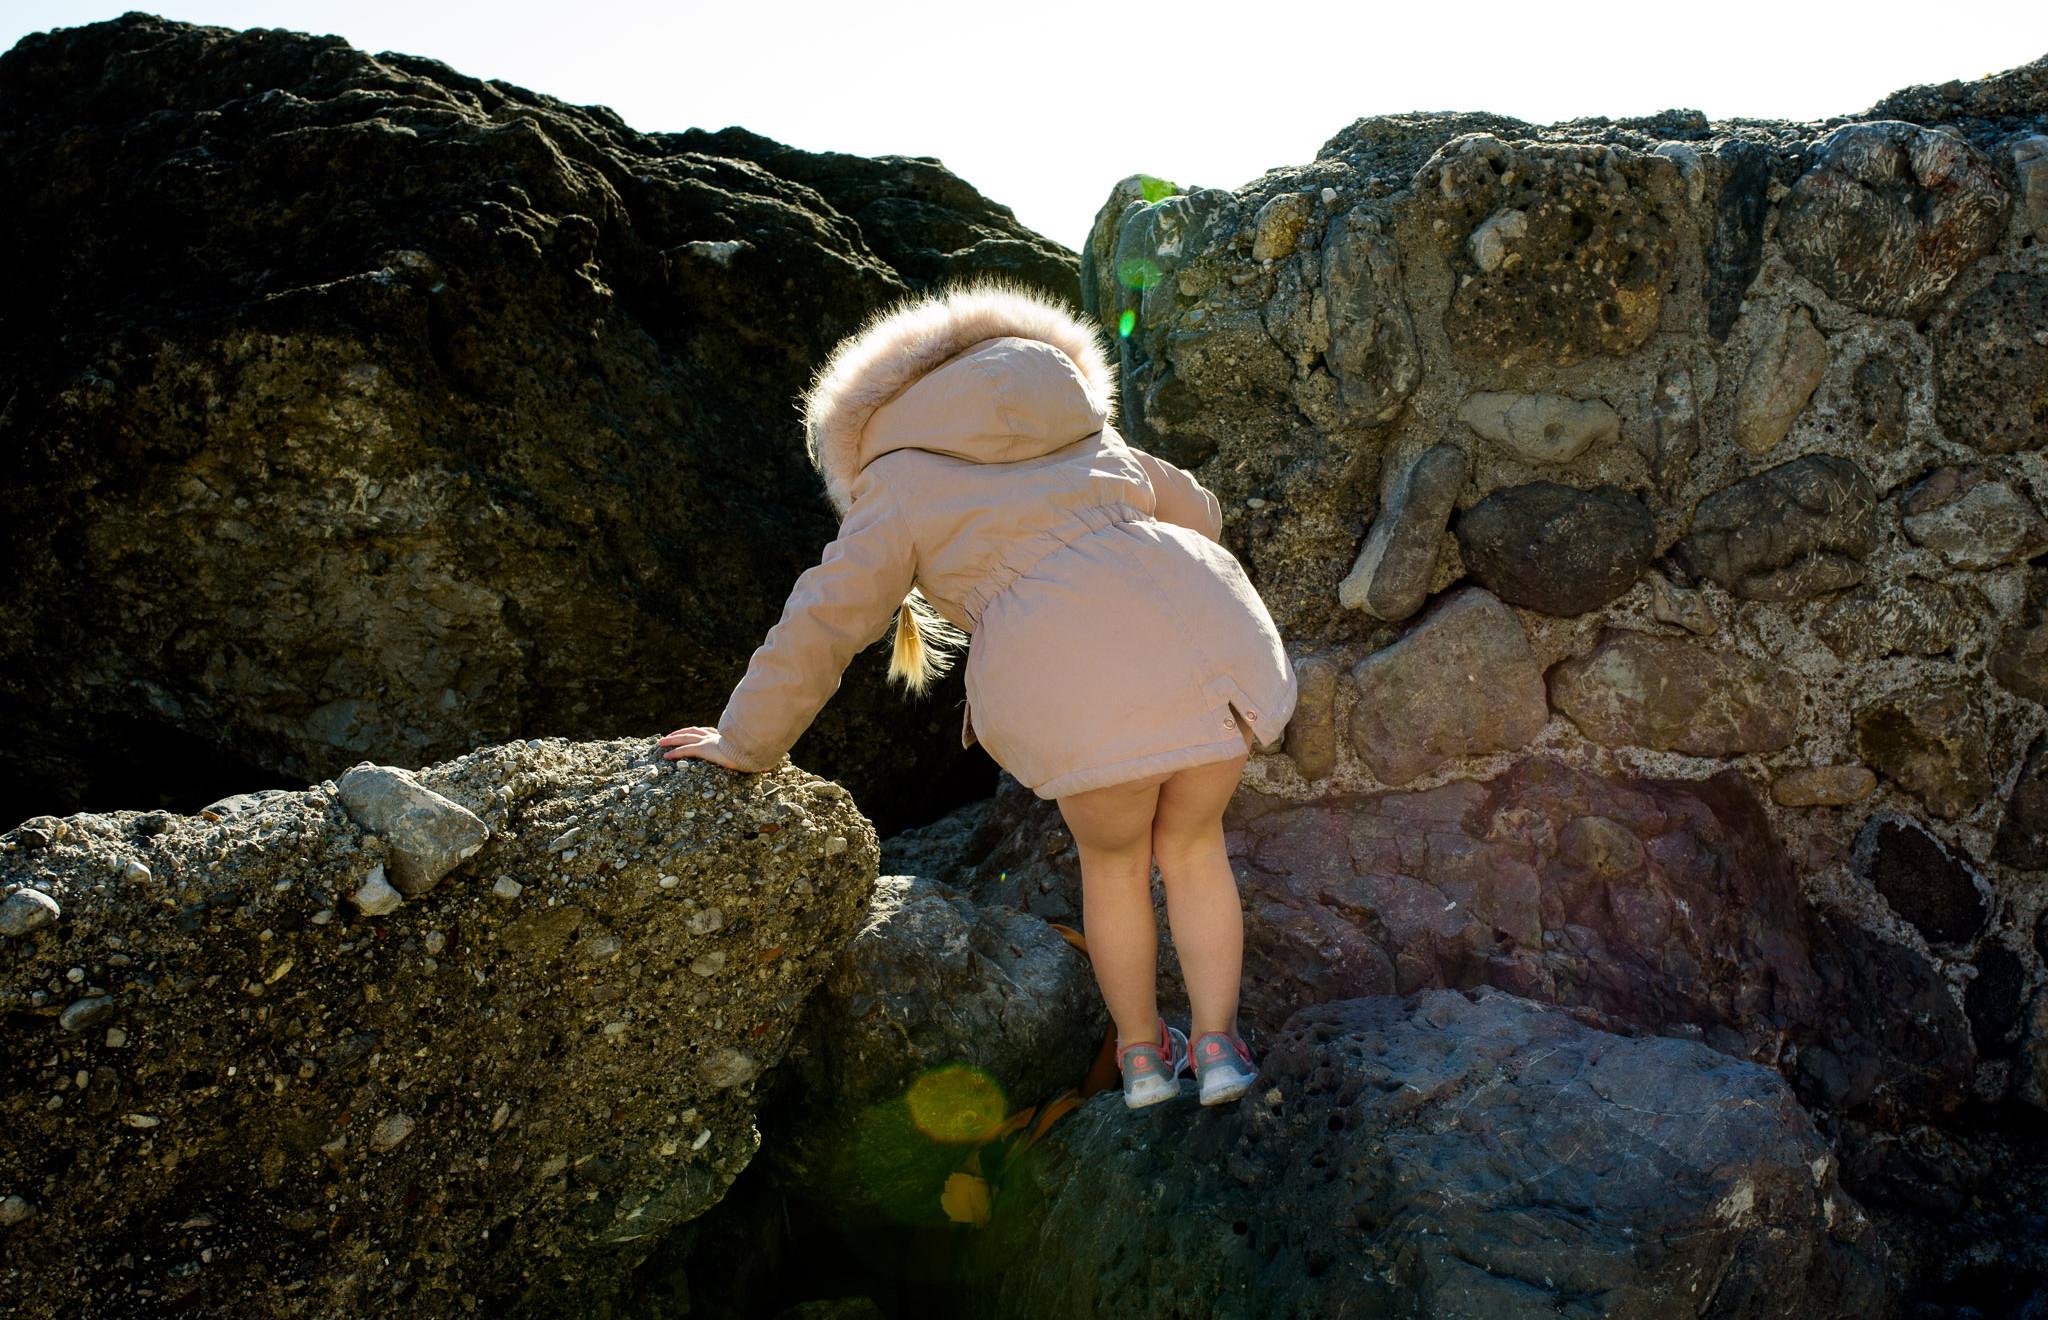 pants-less and climbing on rocks